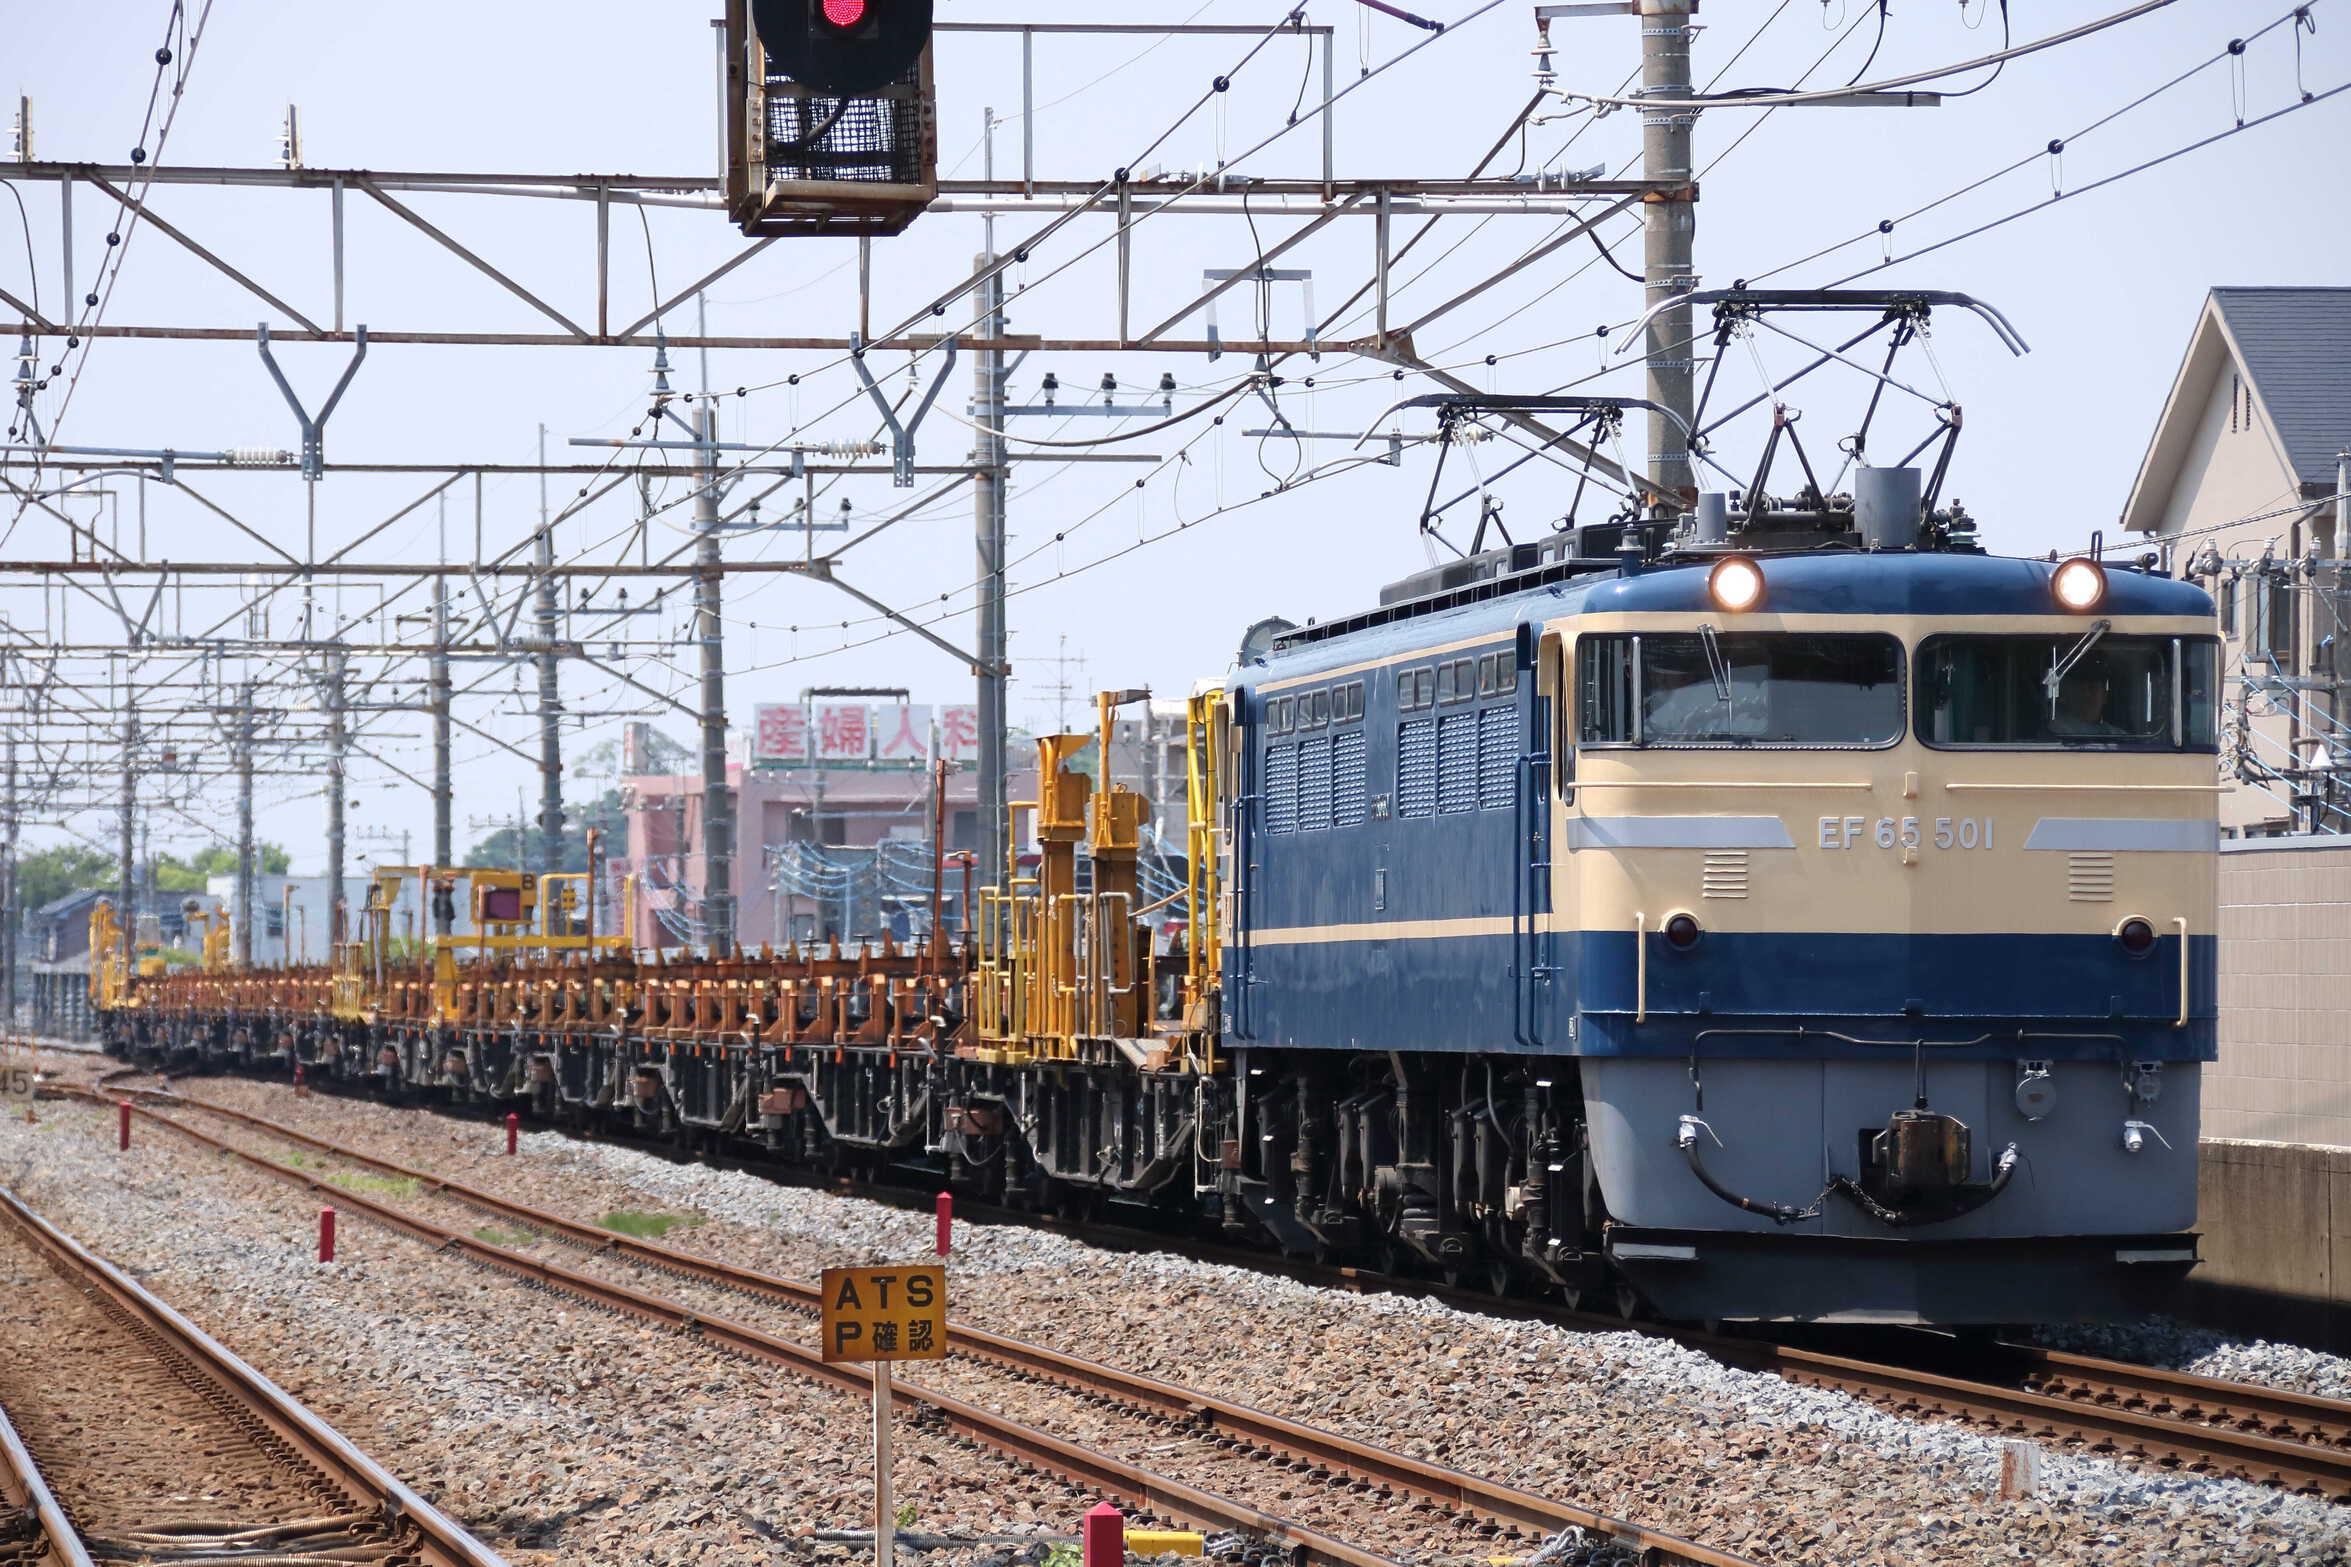 工9562列車 新津工臨返空(新北=2) EF65-501①[高]+ロンチキB編成13両